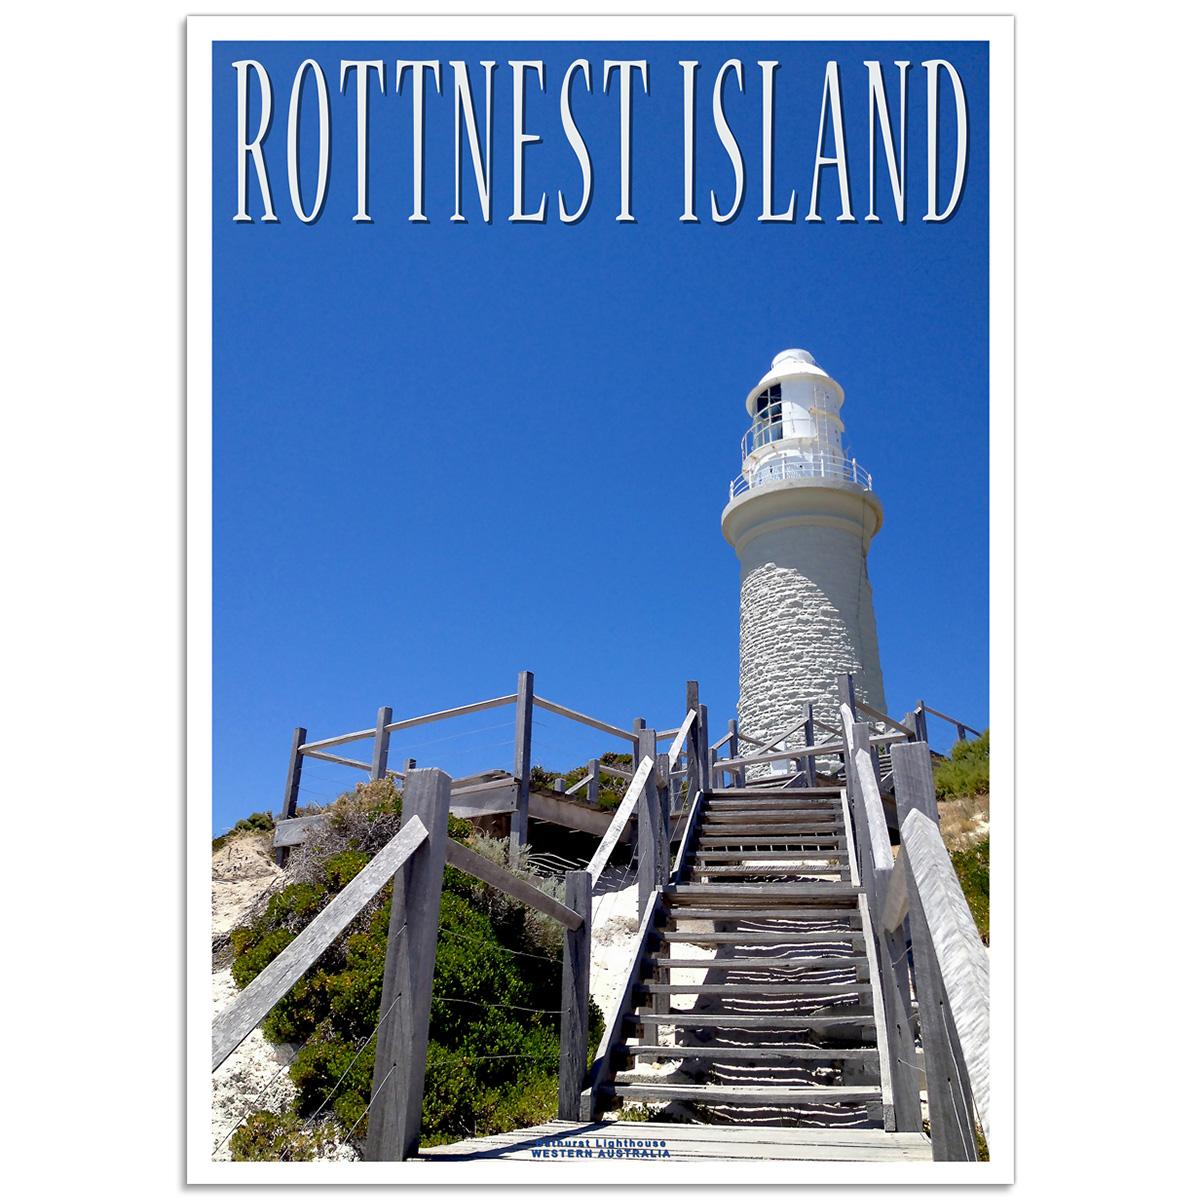 Australian Photographic Poster - Bathurst Lighthouse Rottnest Island